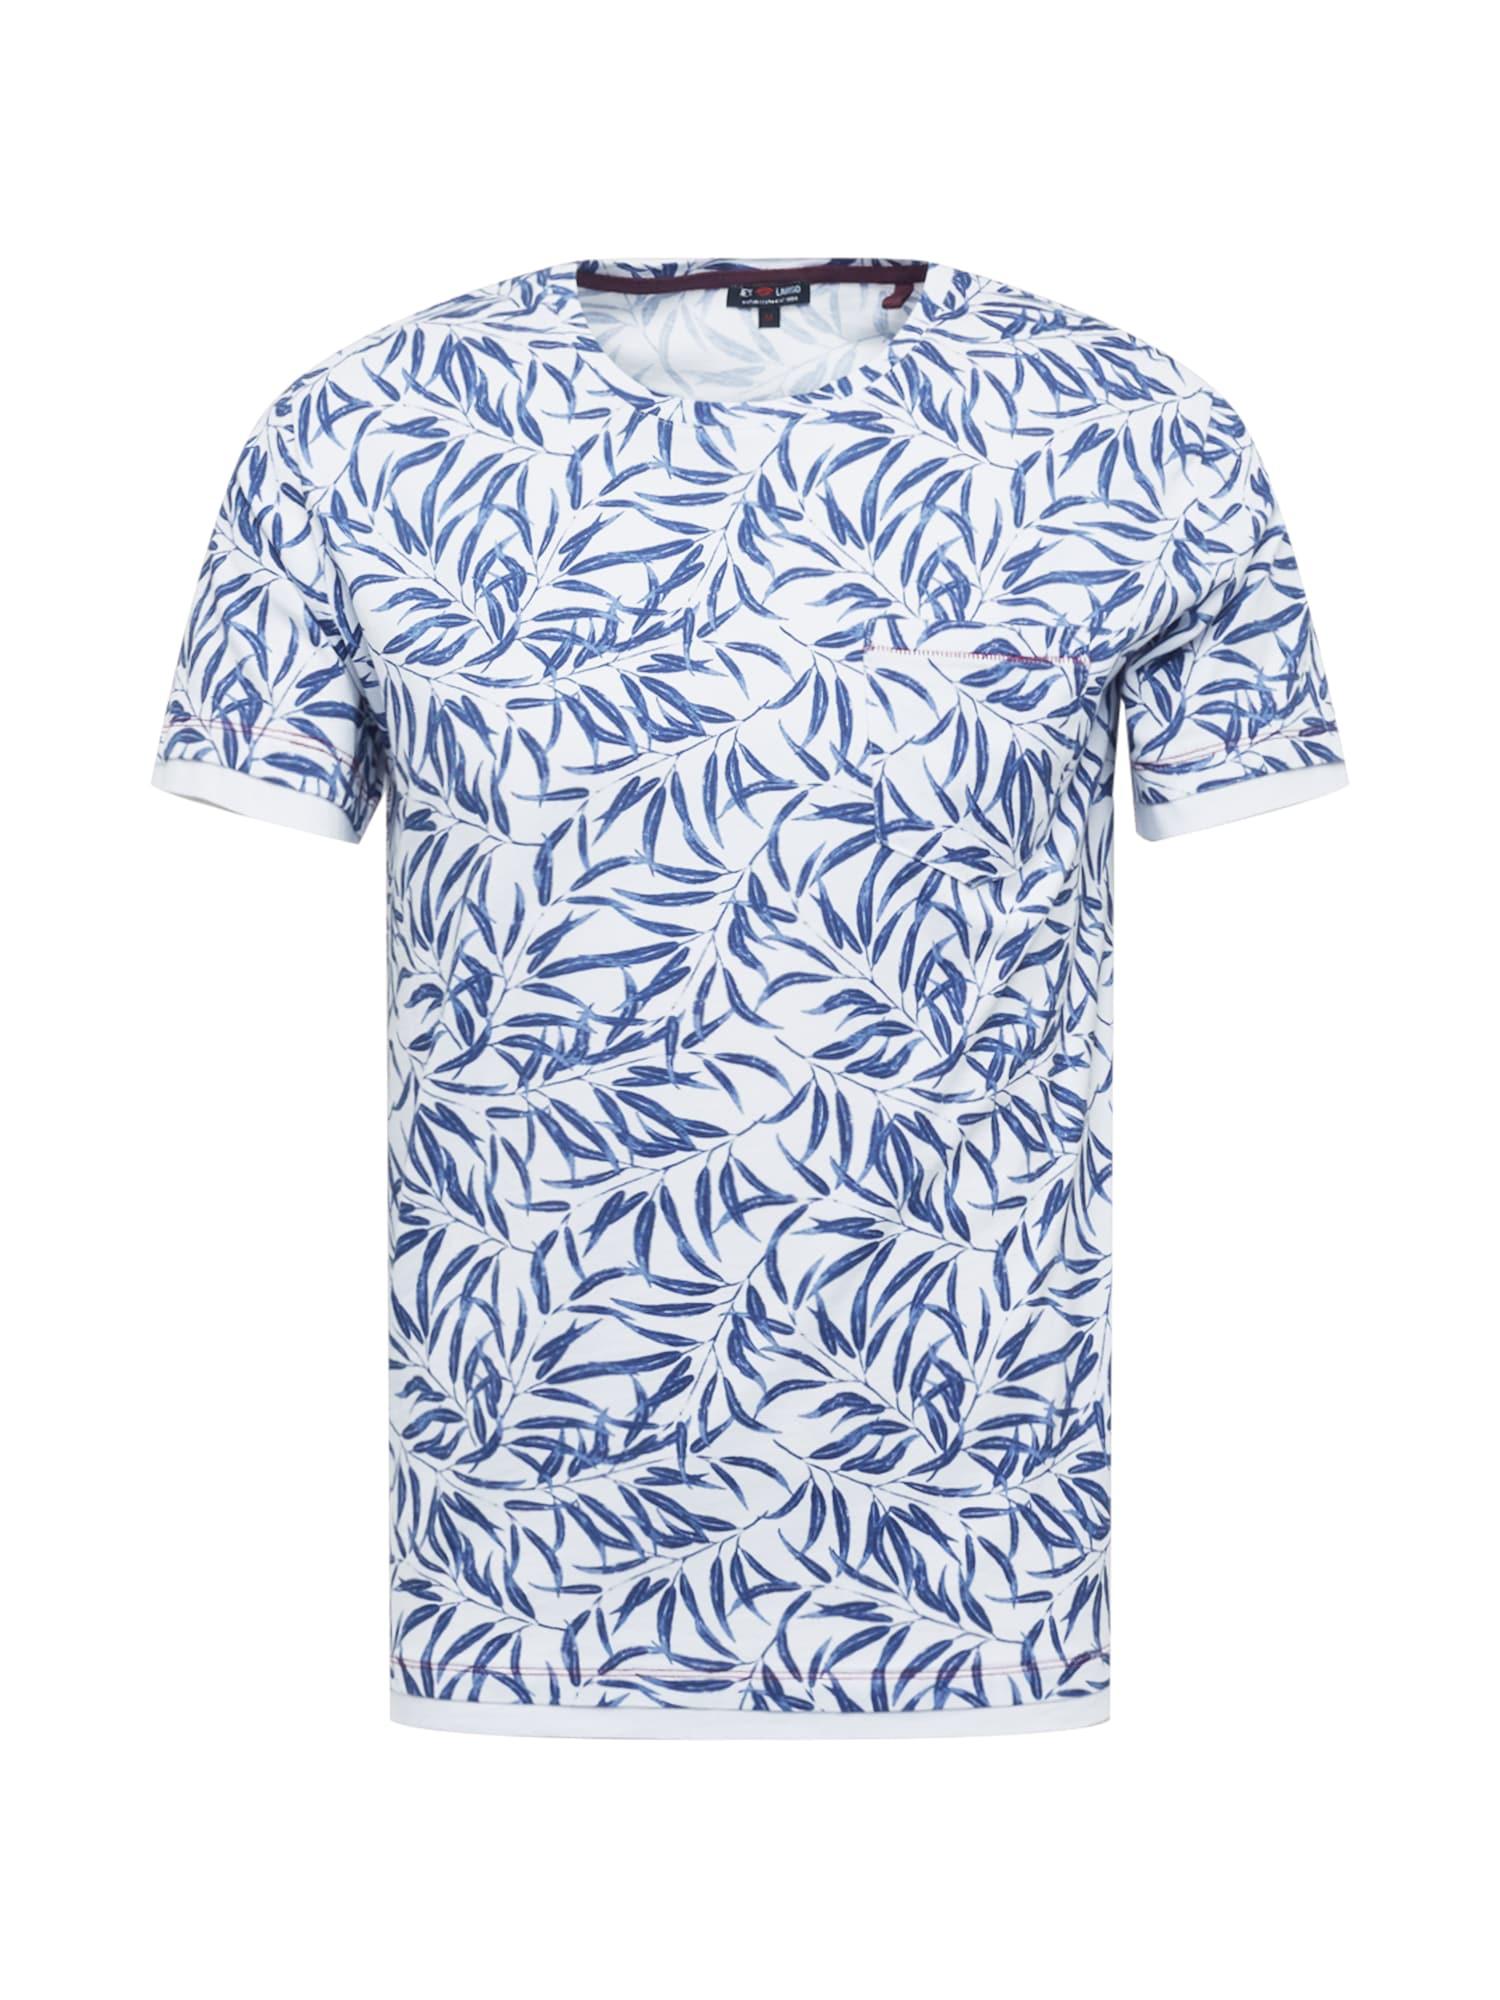 Key Largo T-Shirt 'LOCATION'  - Blanc, Bleu - Taille: S - male